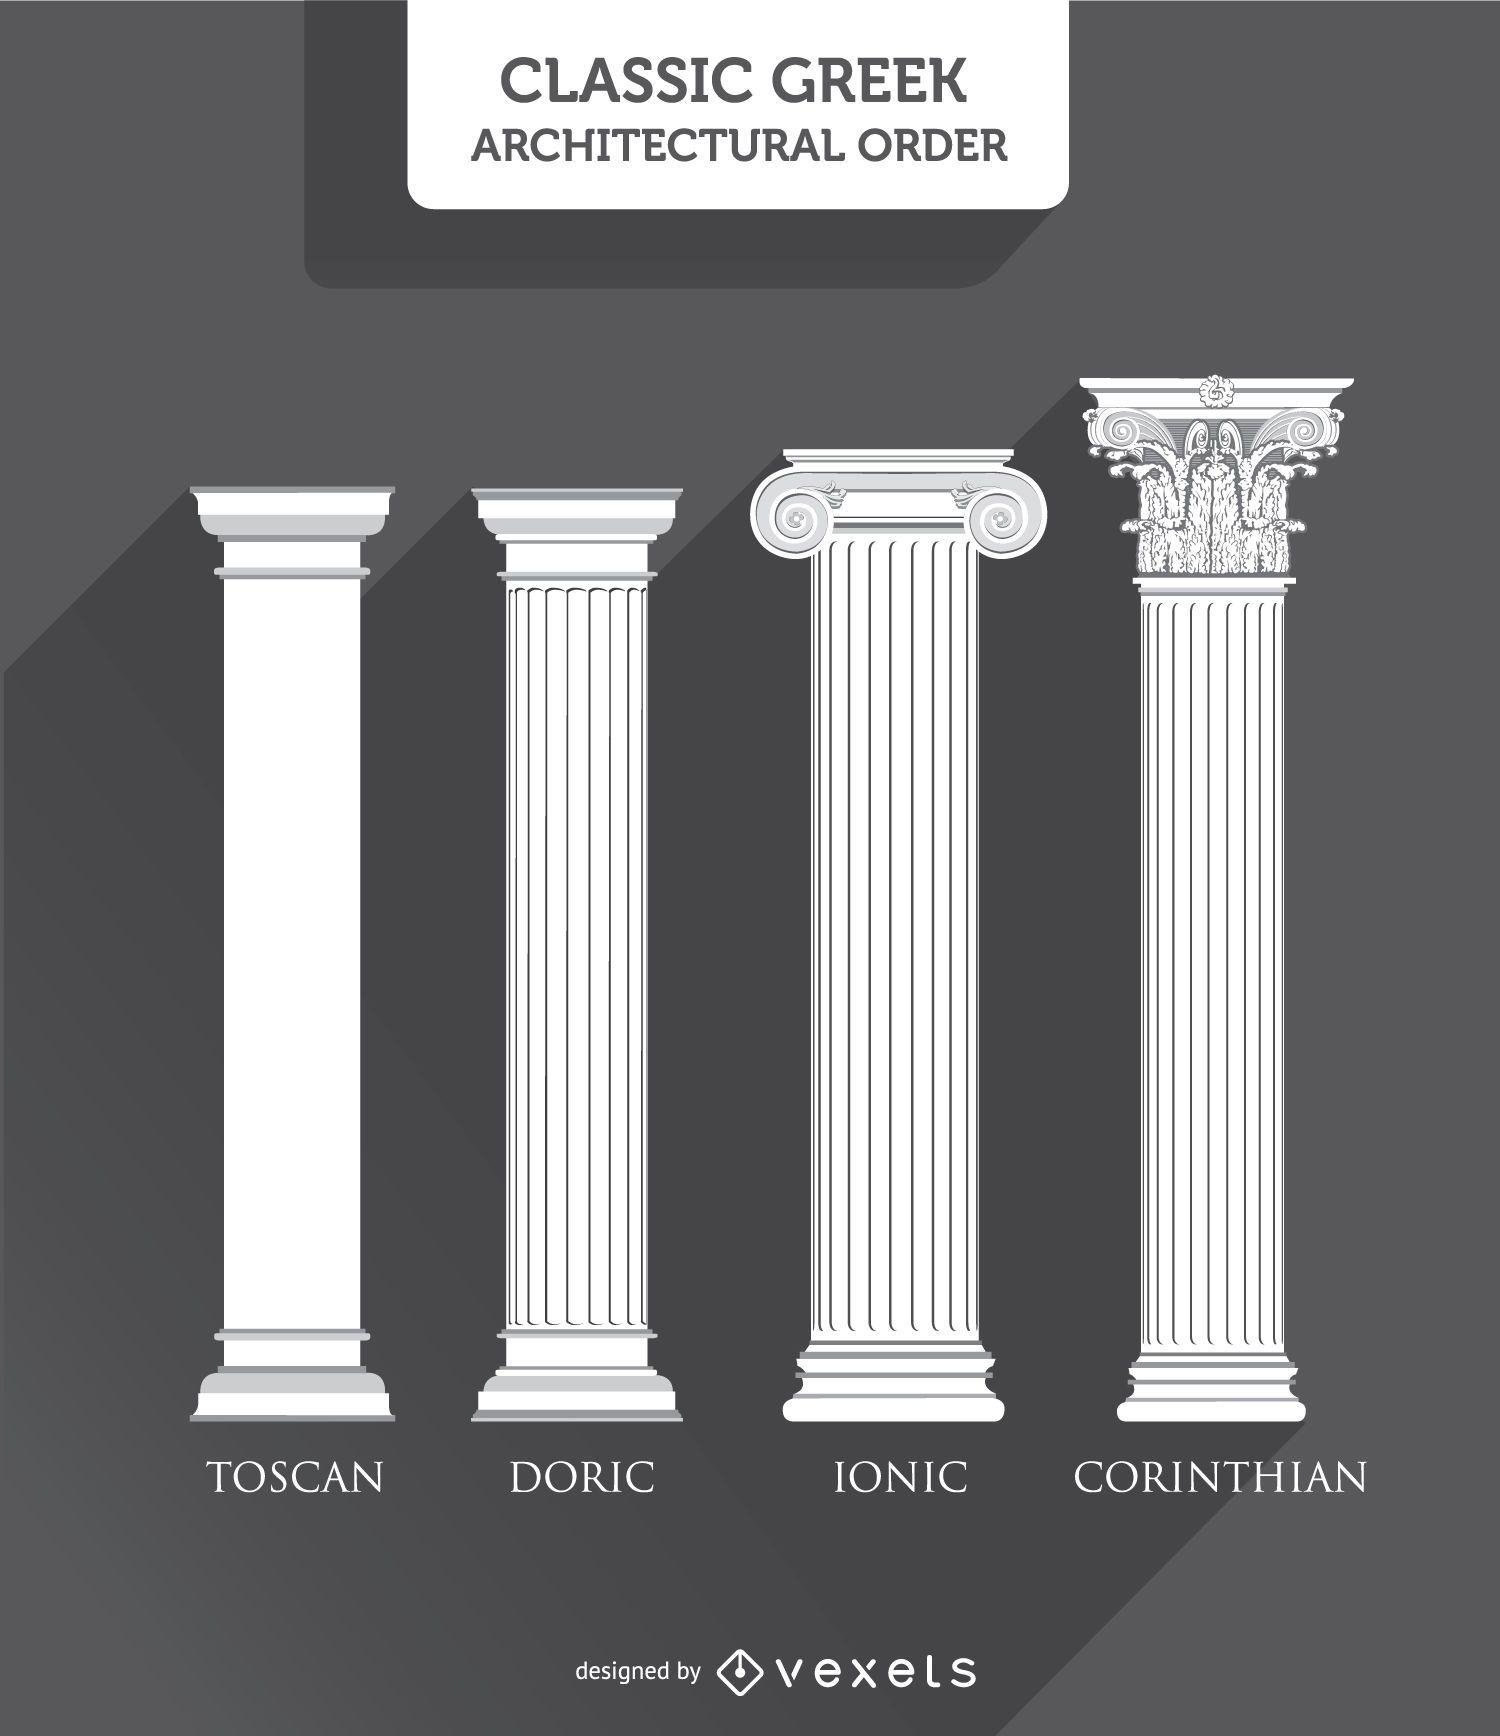 Greek Columns Styles Toscan Doric Ionic And Corinthian